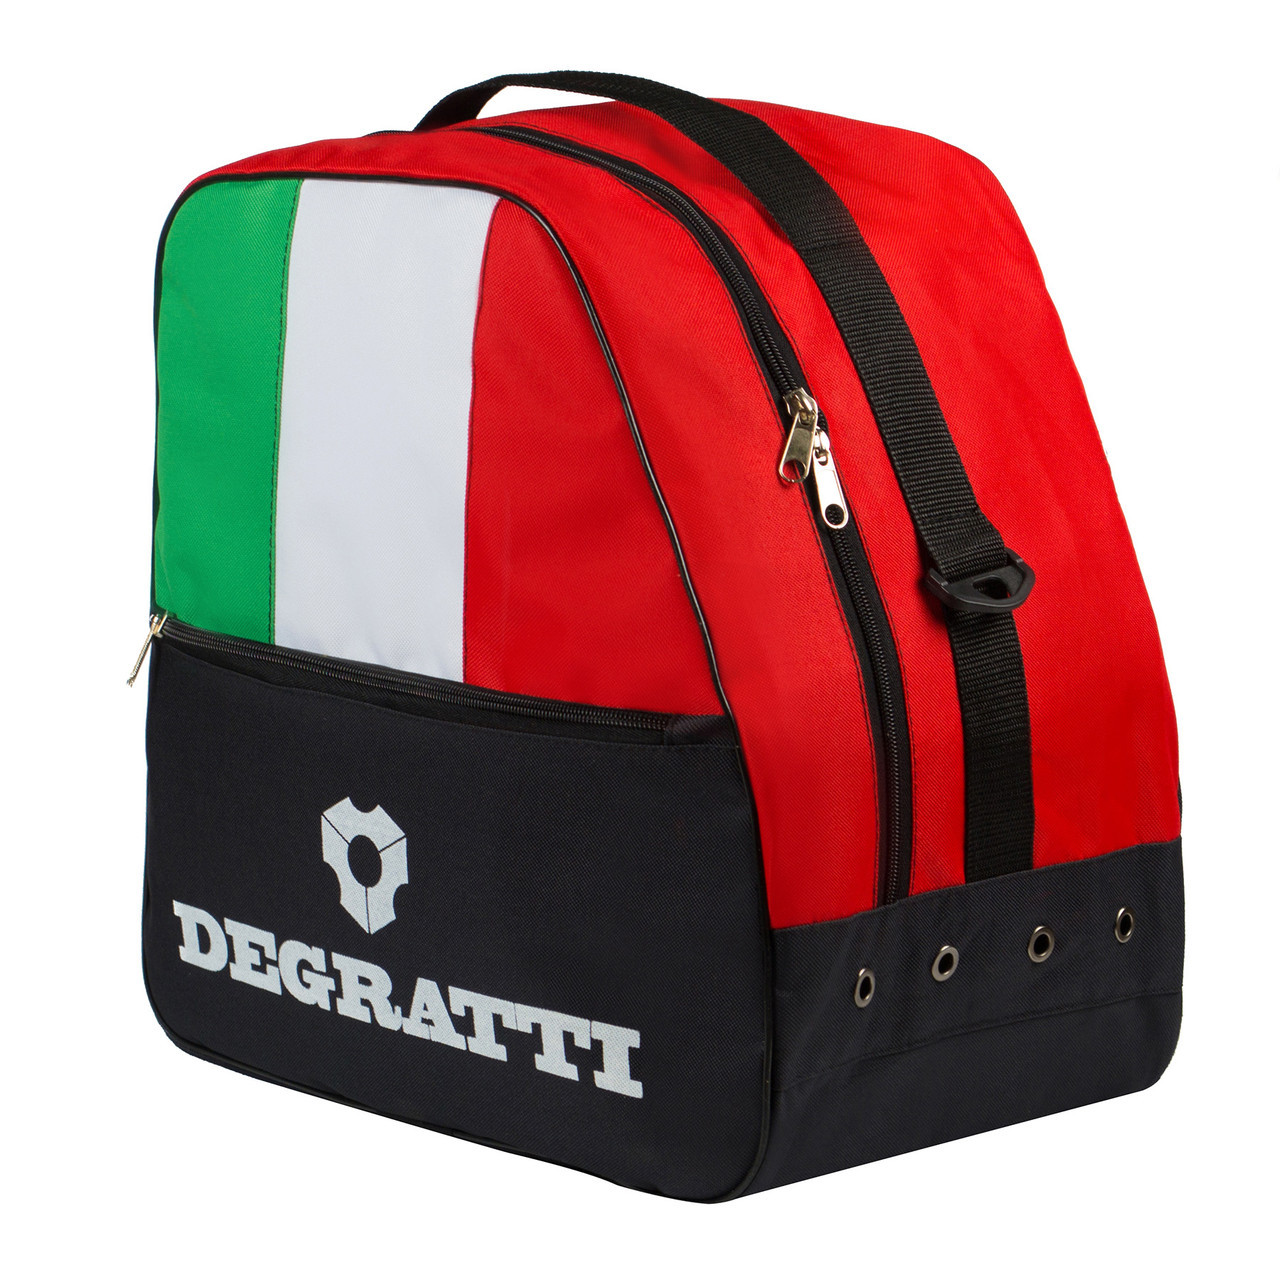 Сумка для черевиків Degratti Boots Italia Разноцветный